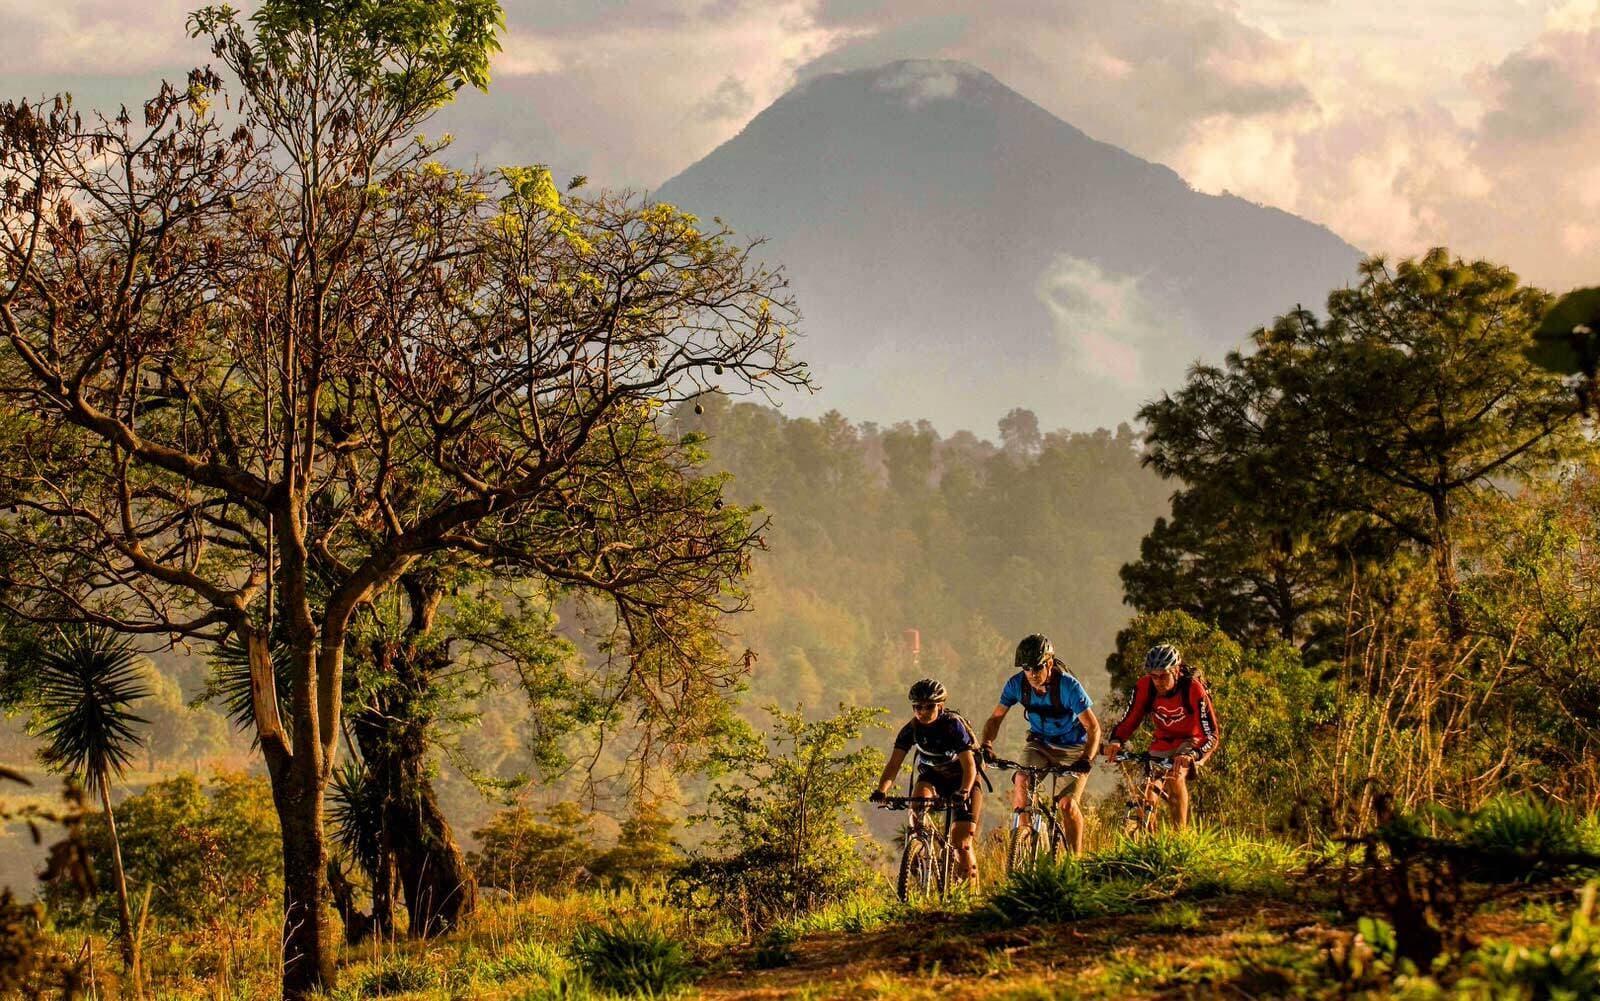 Golden Arches Volcano Trail2